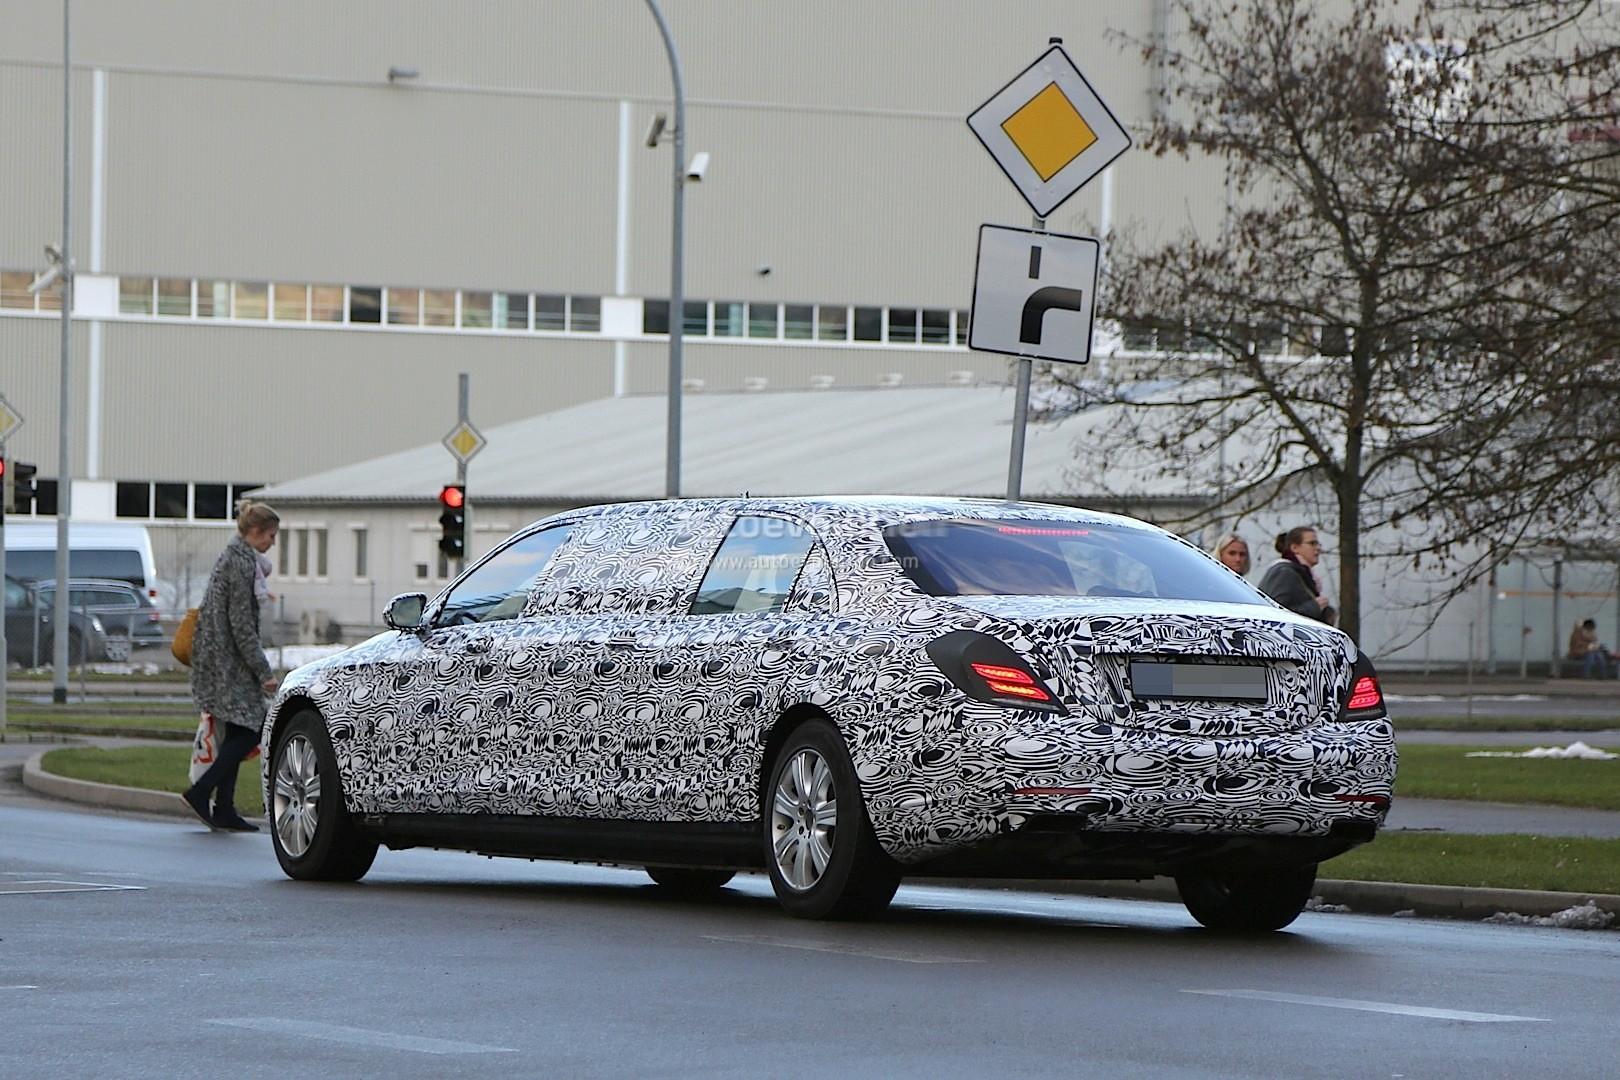 MercedesBenz S Pullman Interior Spyshots Show Armour - 1 million mercedes coolest armoured vehicle ever